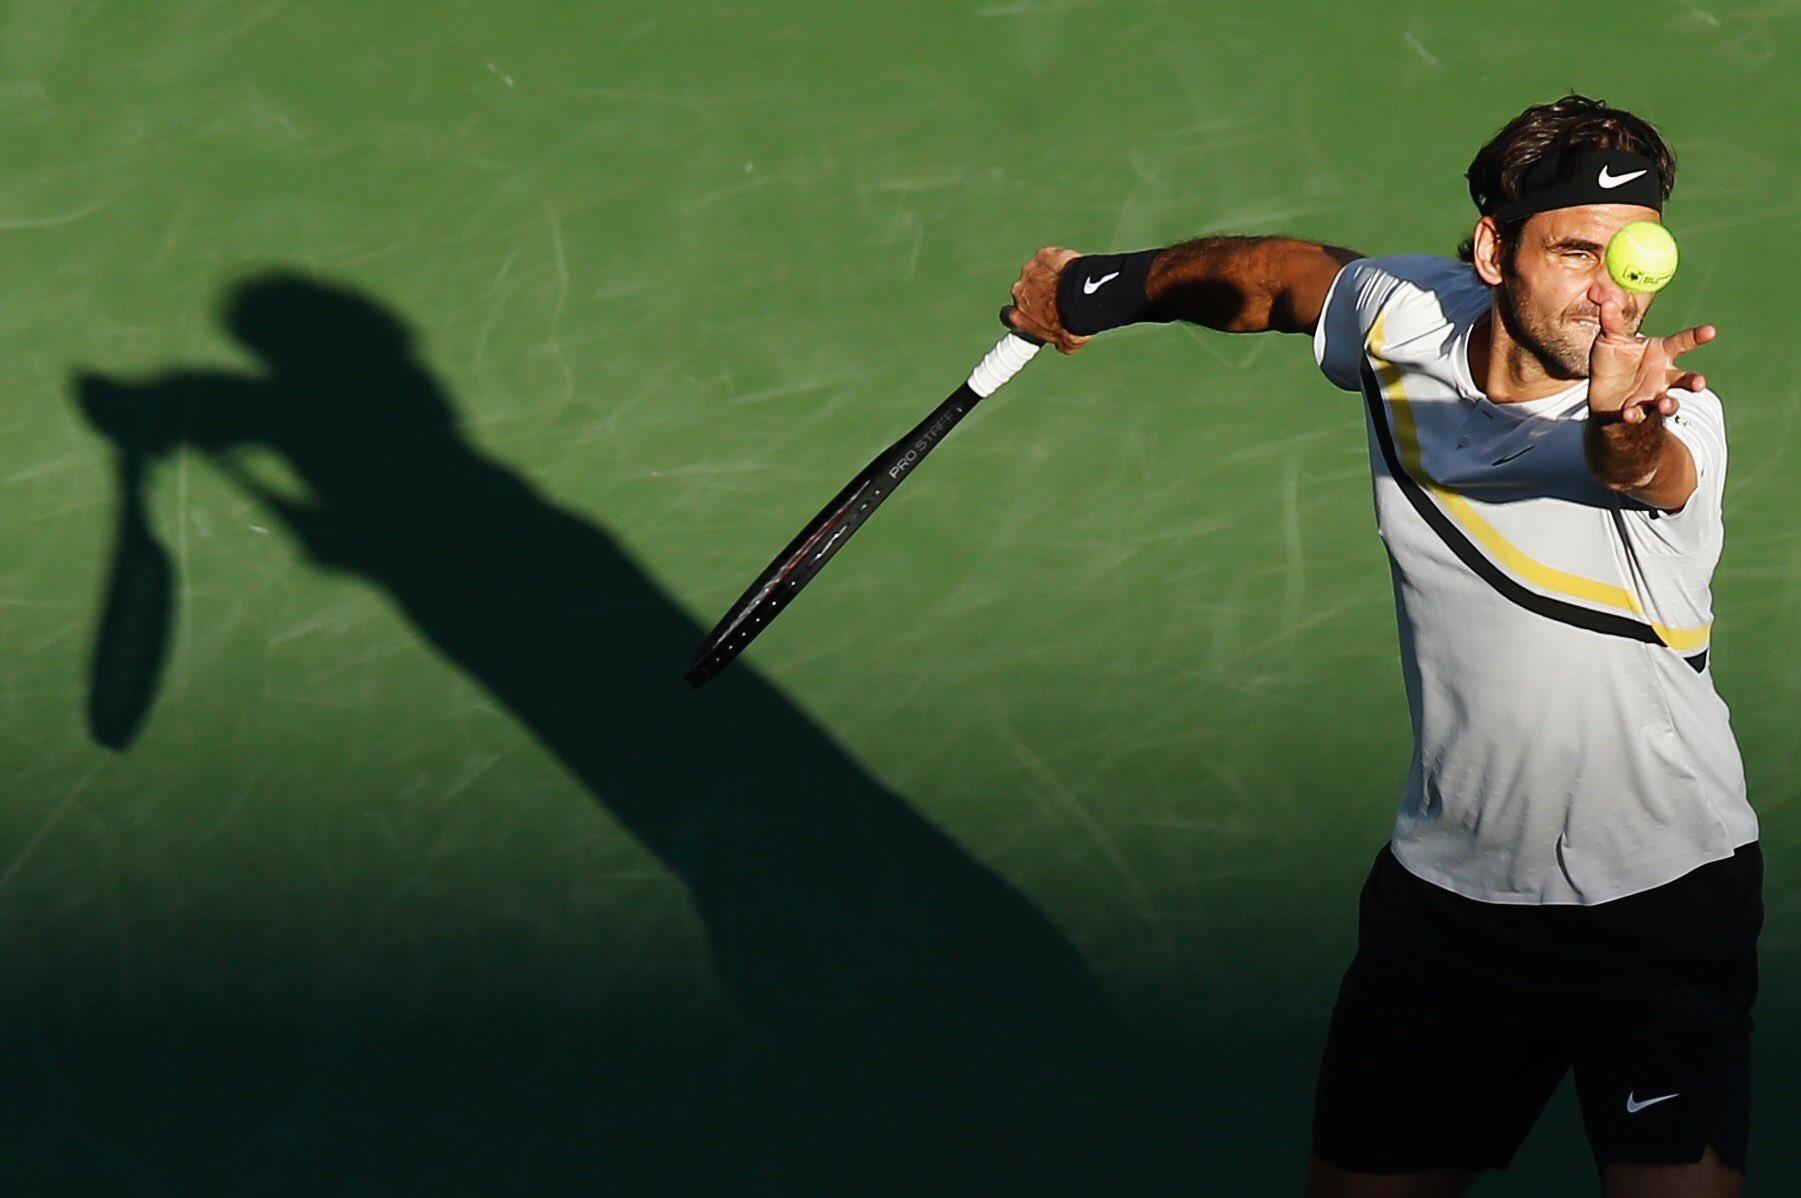 Roger Federer 2018 BNP Paribas Open (Indian Wells BNPPO18) - Federer Wins 60th Match at BNP Paribas Open